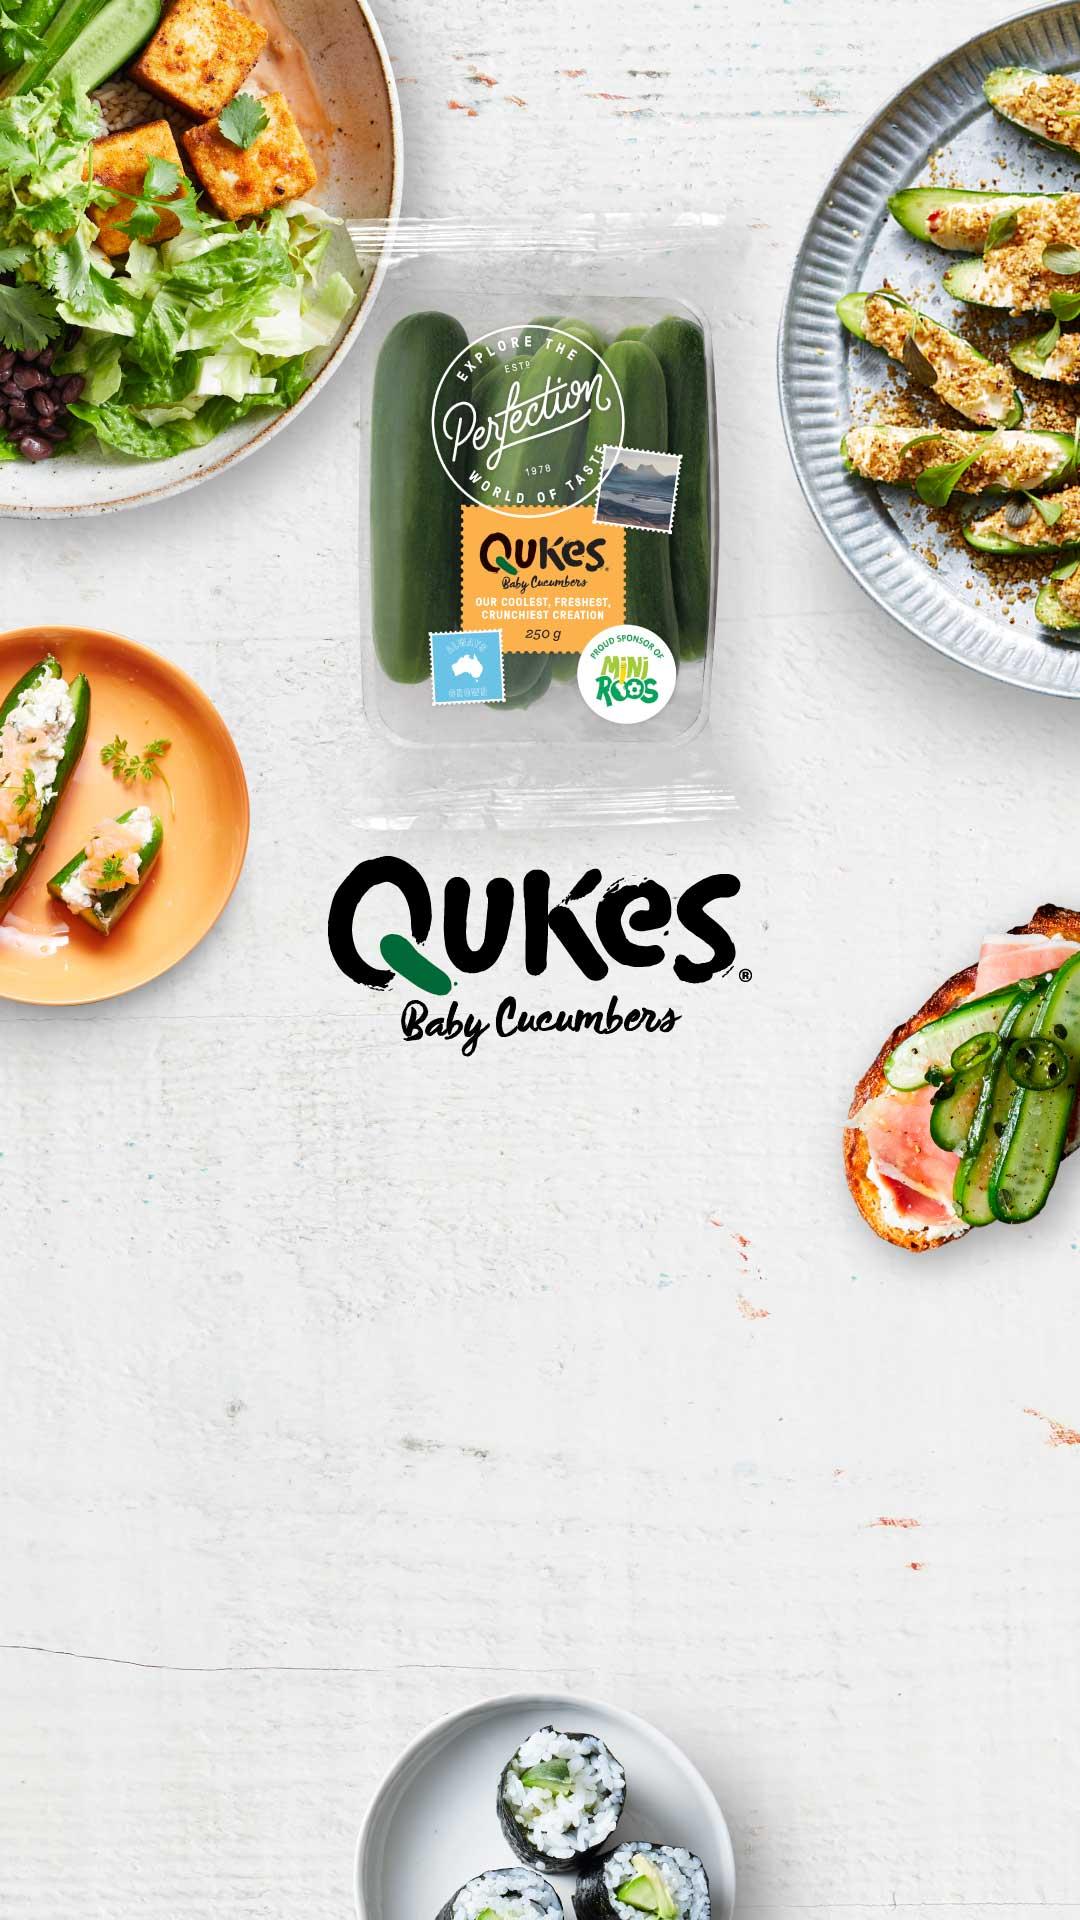 Qukes Snacking banner